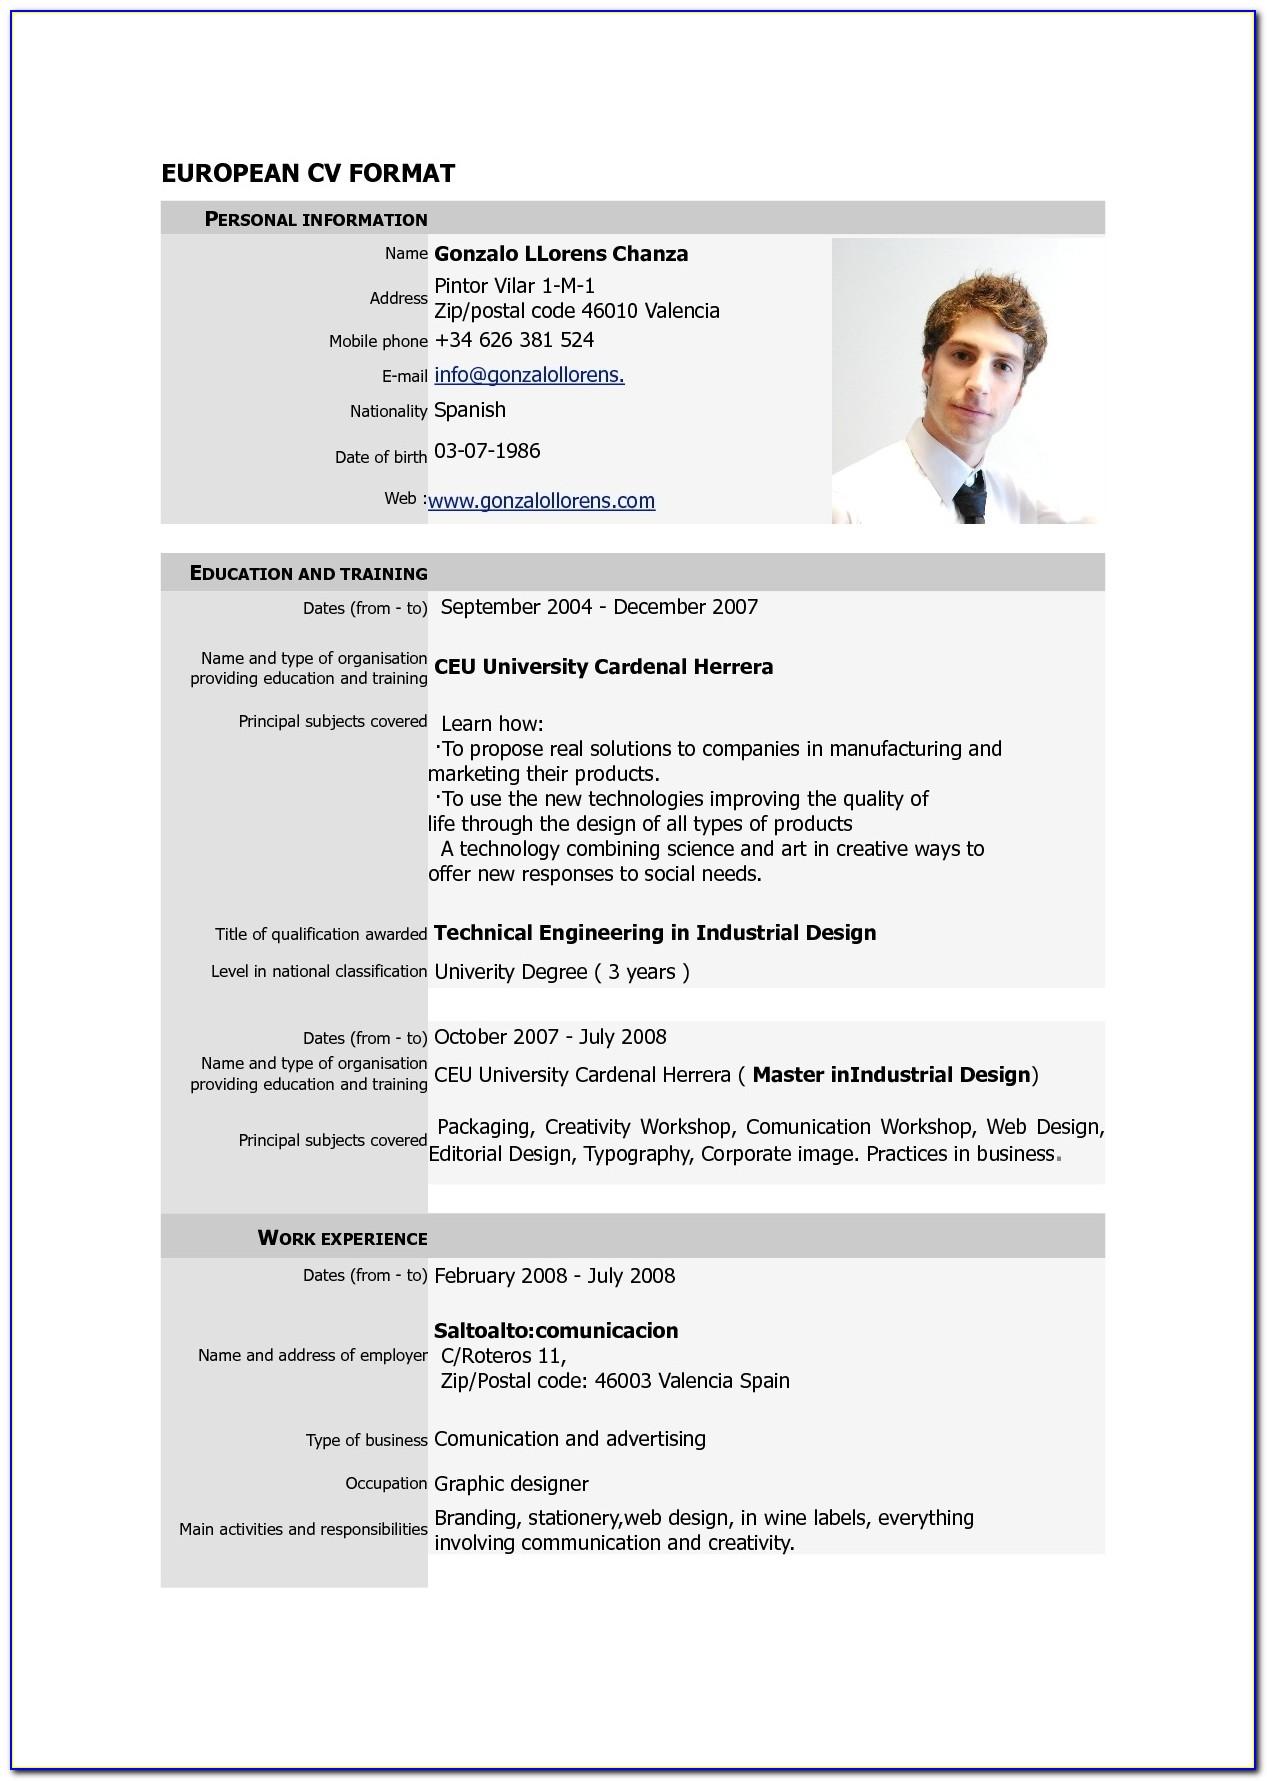 Resume Templates 2017 To Impress Your Employee   Resume Templates 2017 Intended For Best Resume Template 2017